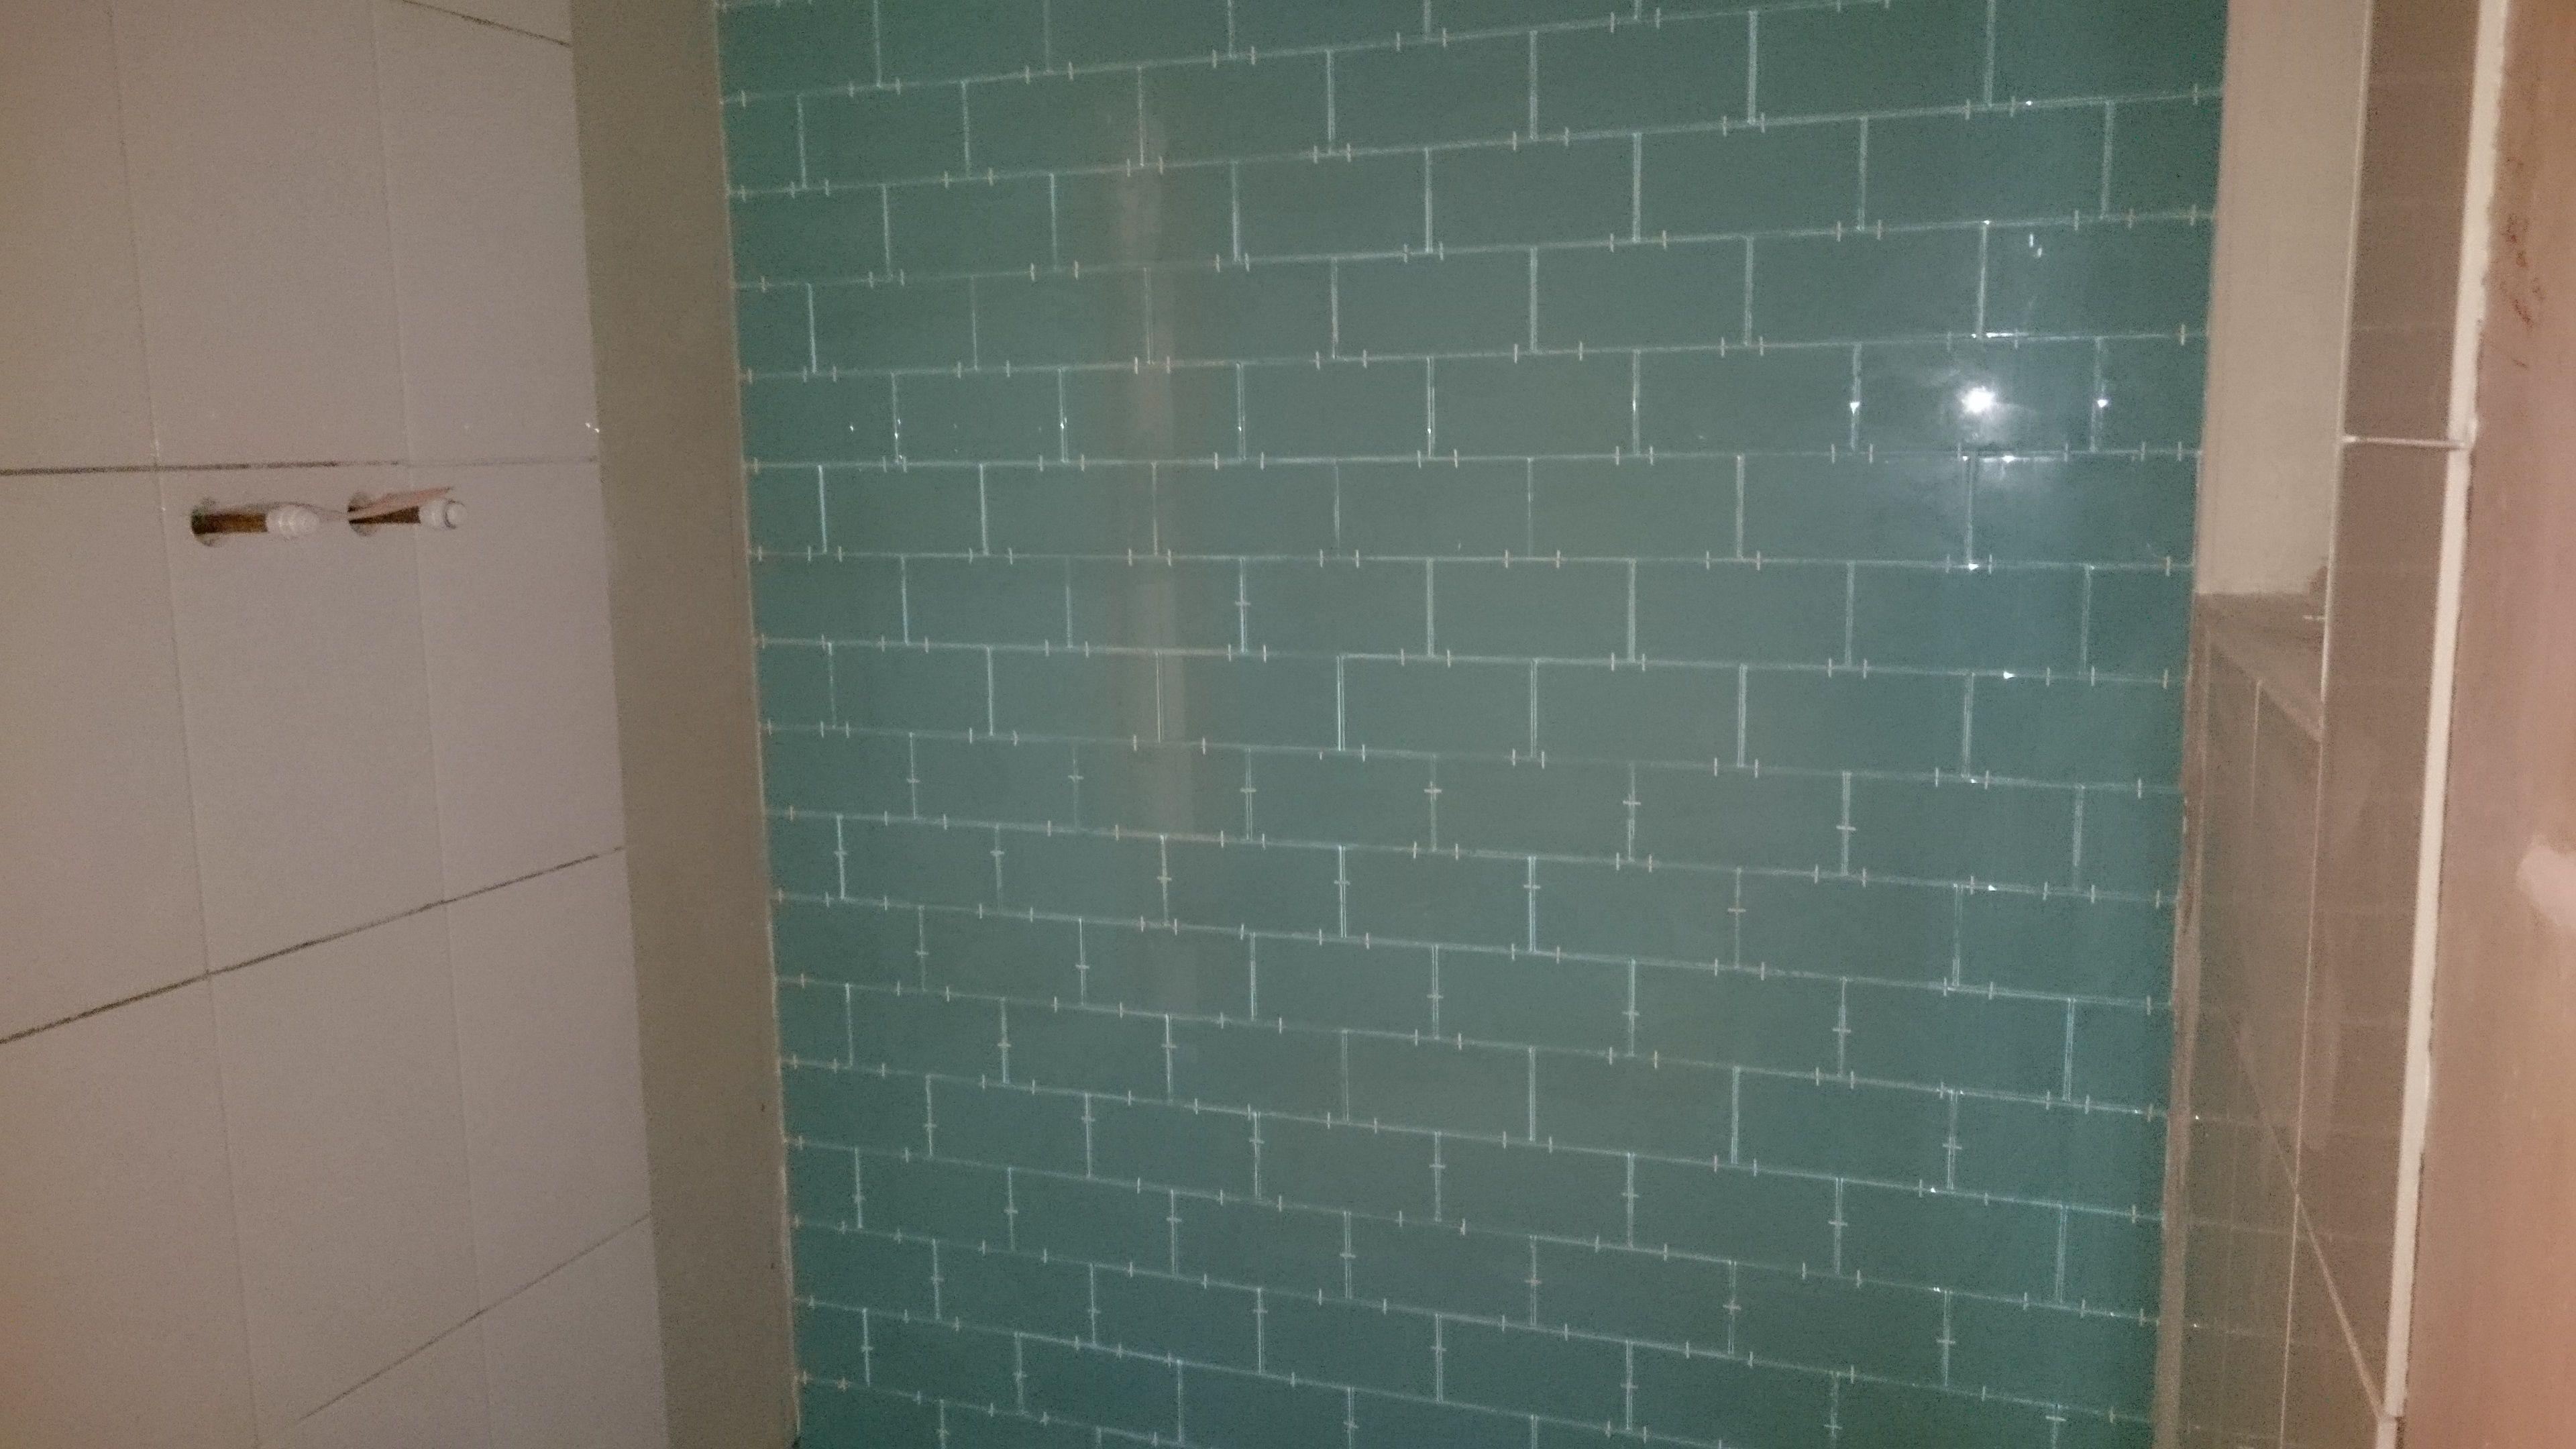 glass tiles tile fall bathroom and ideas sink decor g border door